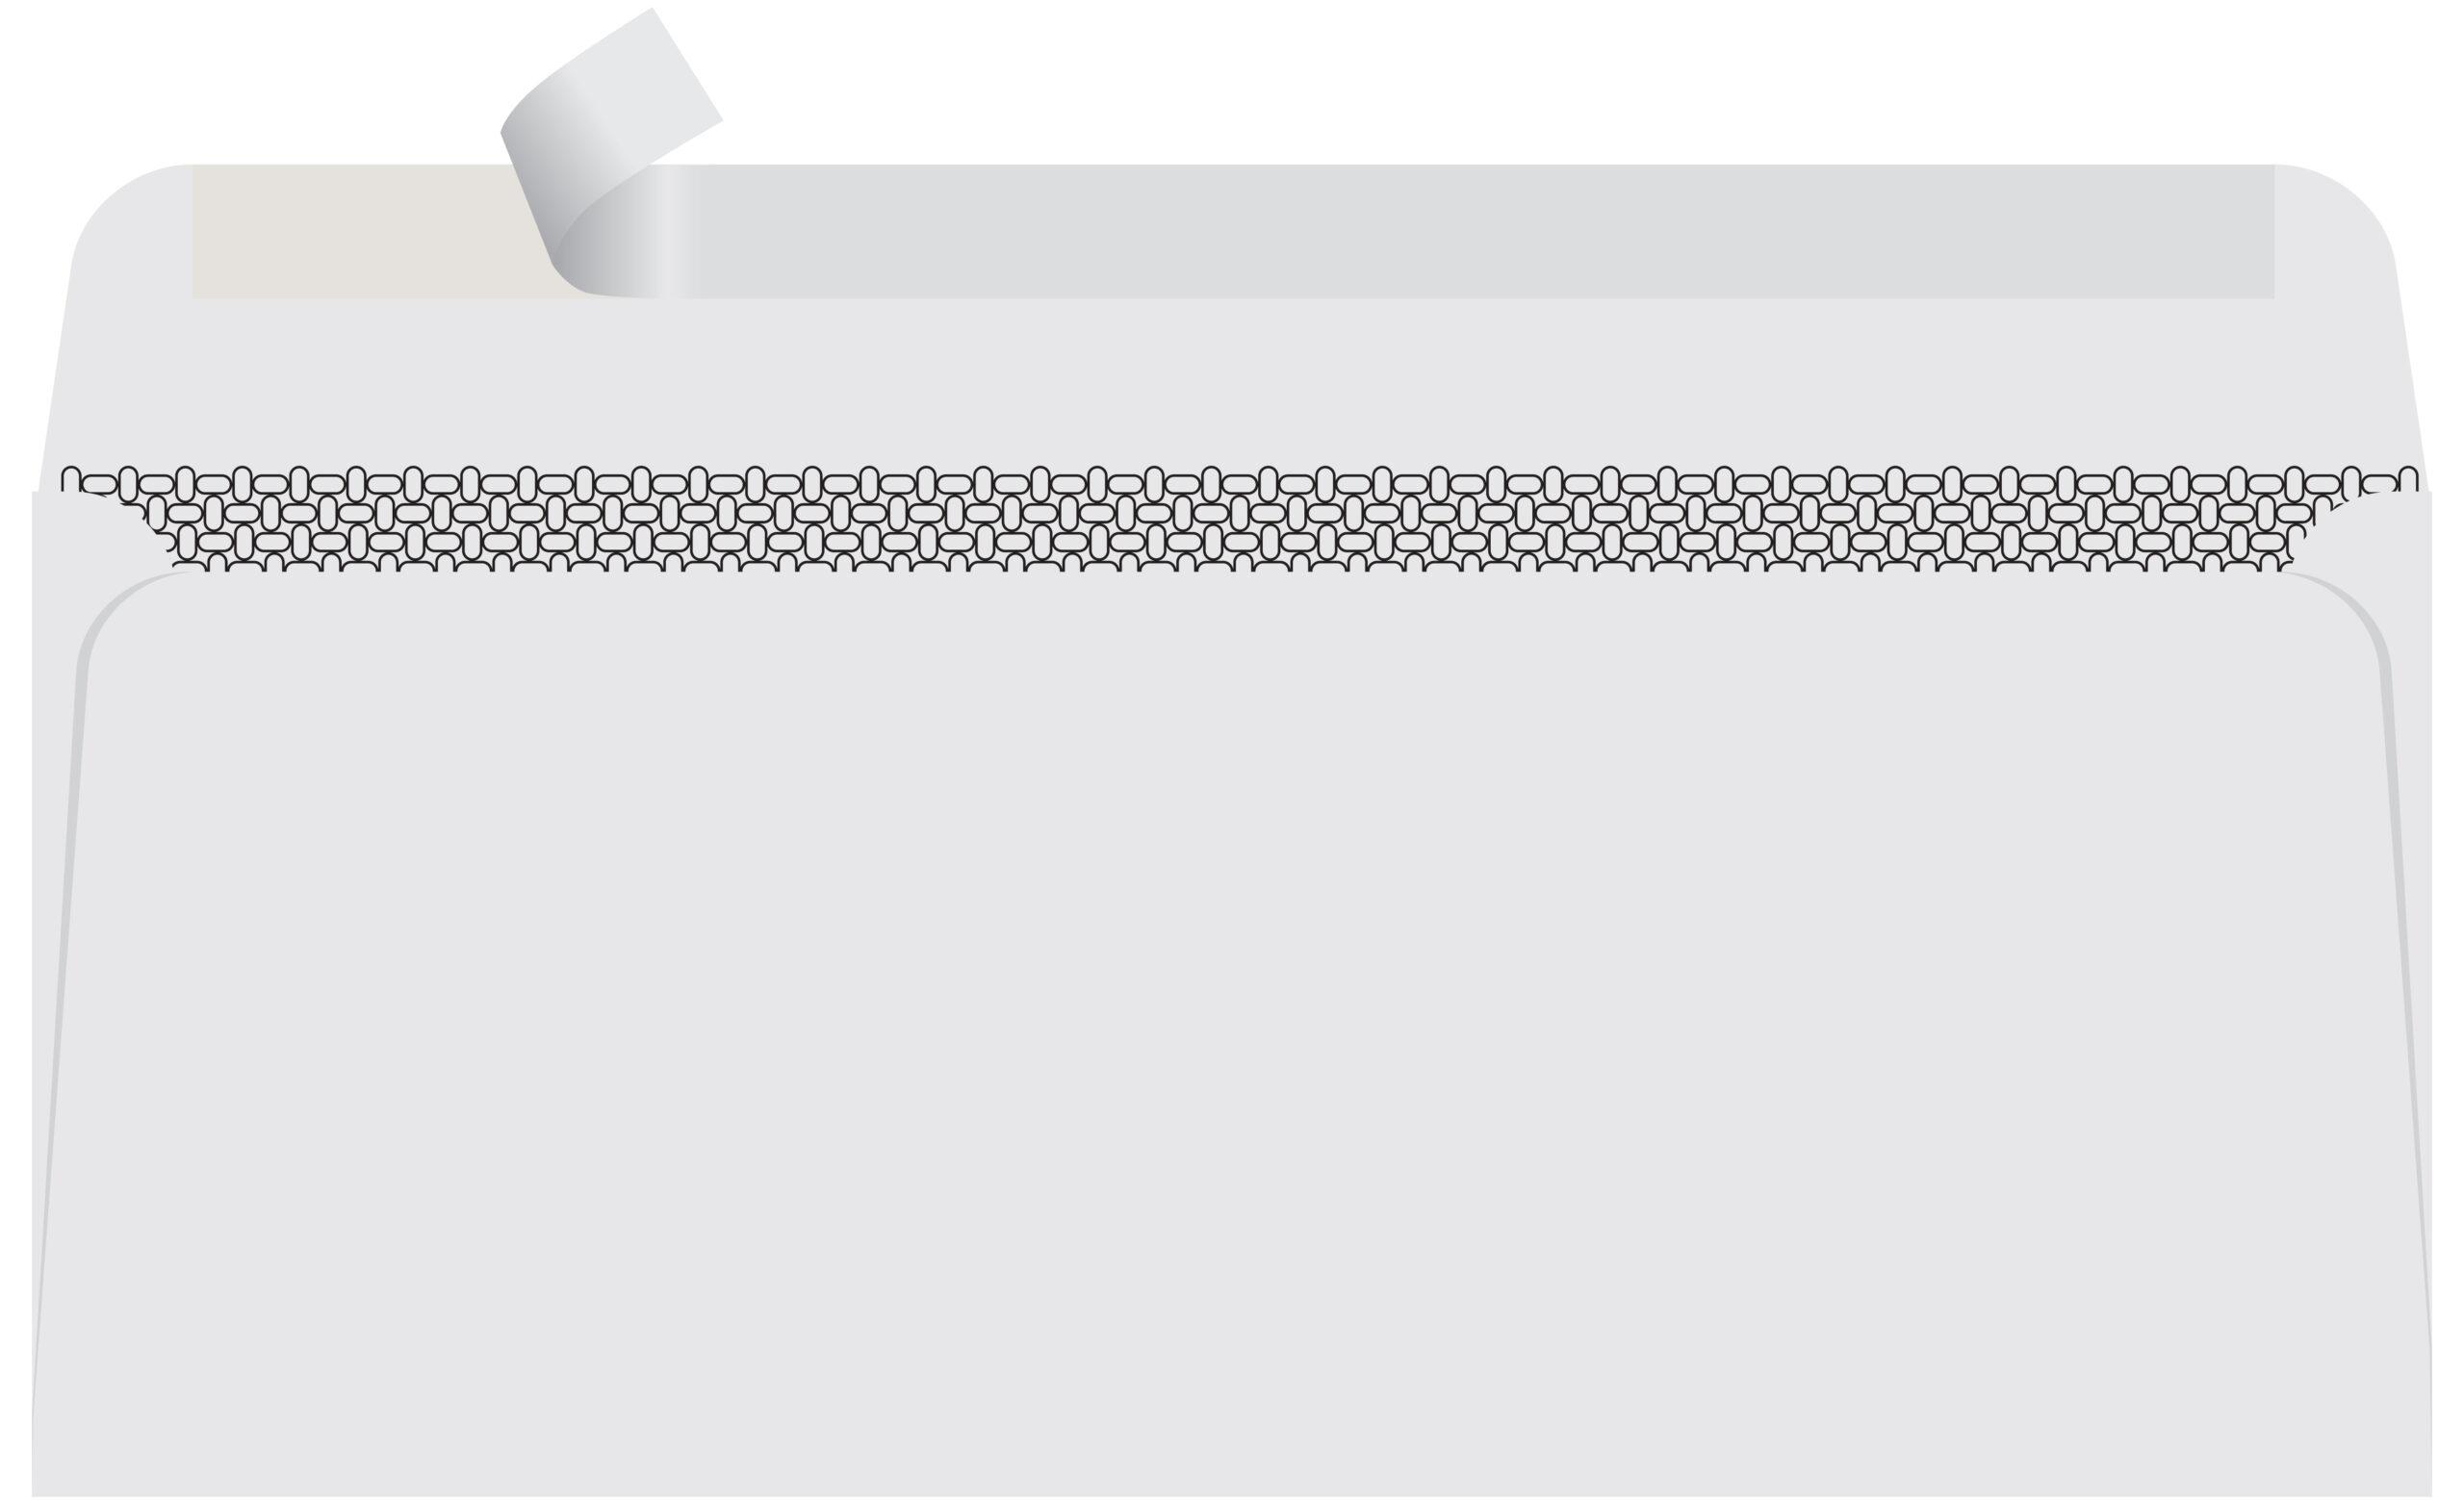 copy machine service